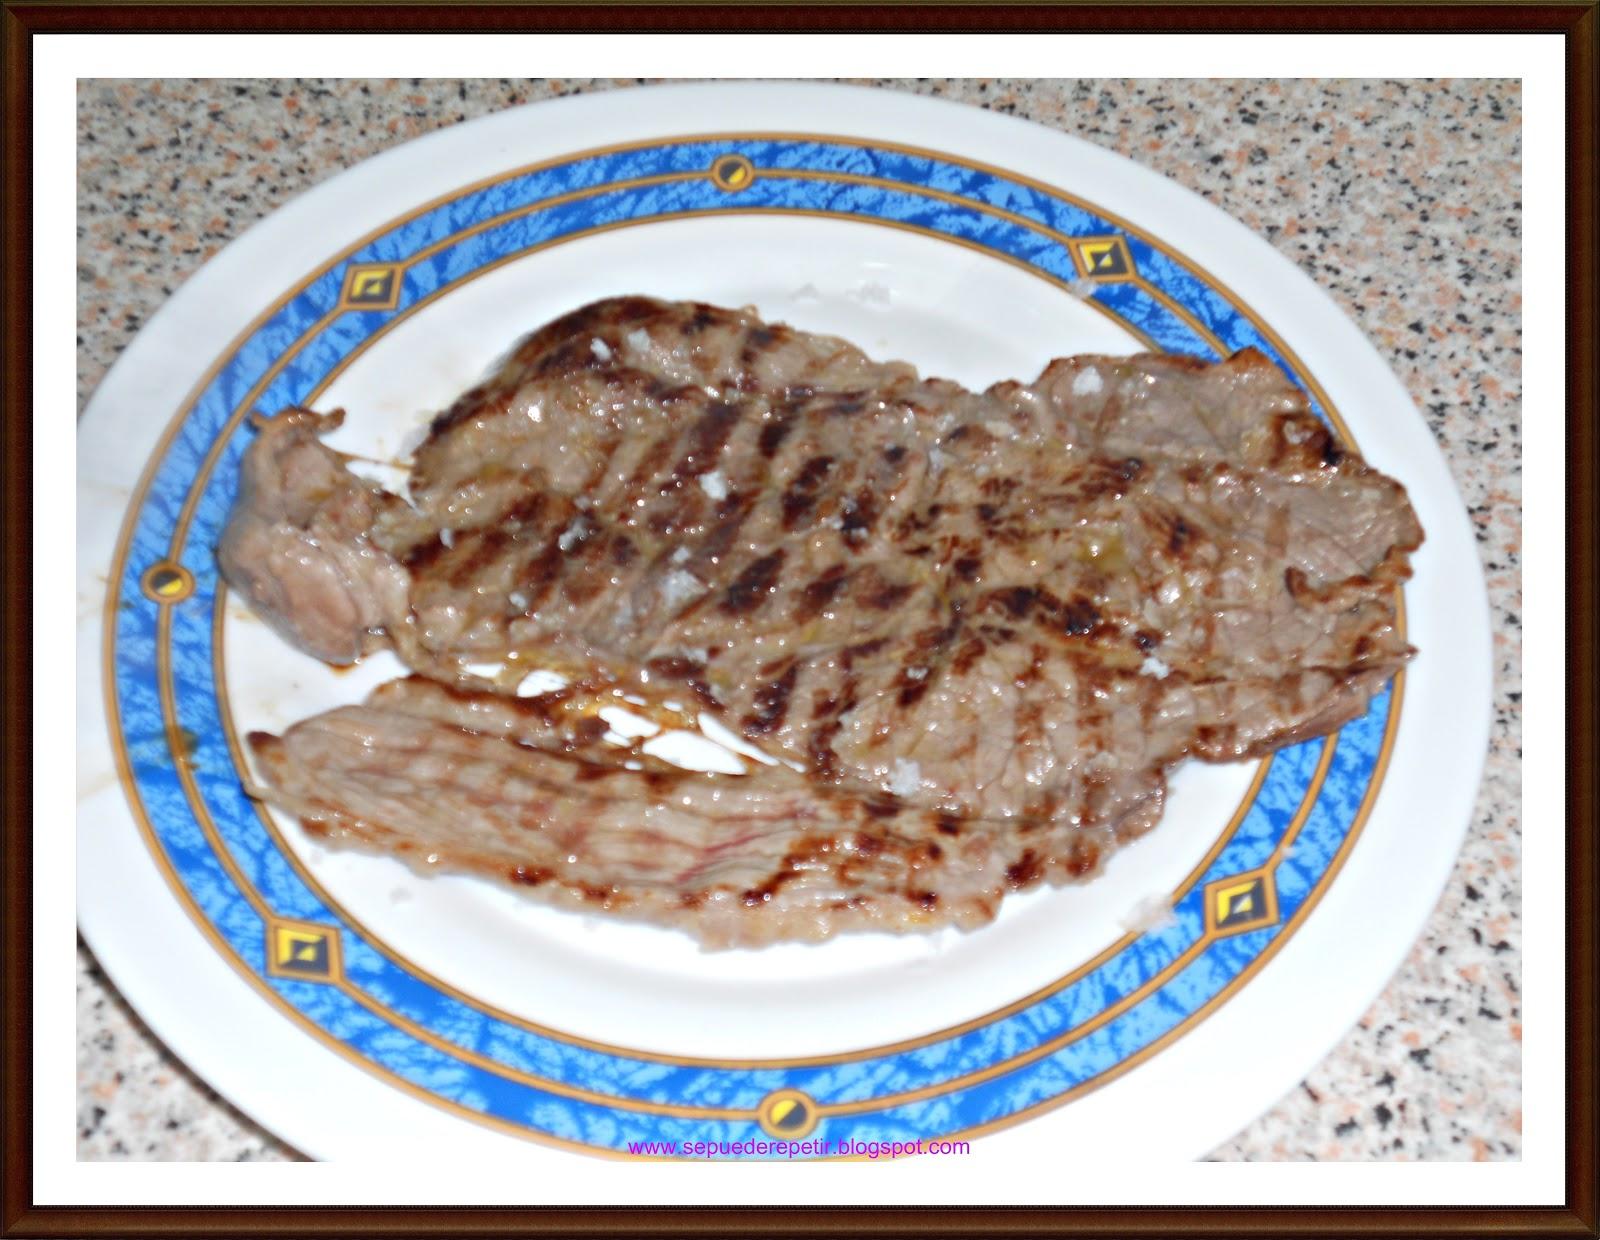 Se puede repetir filete de ternera a la plancha for Cocinar filetes de ternera